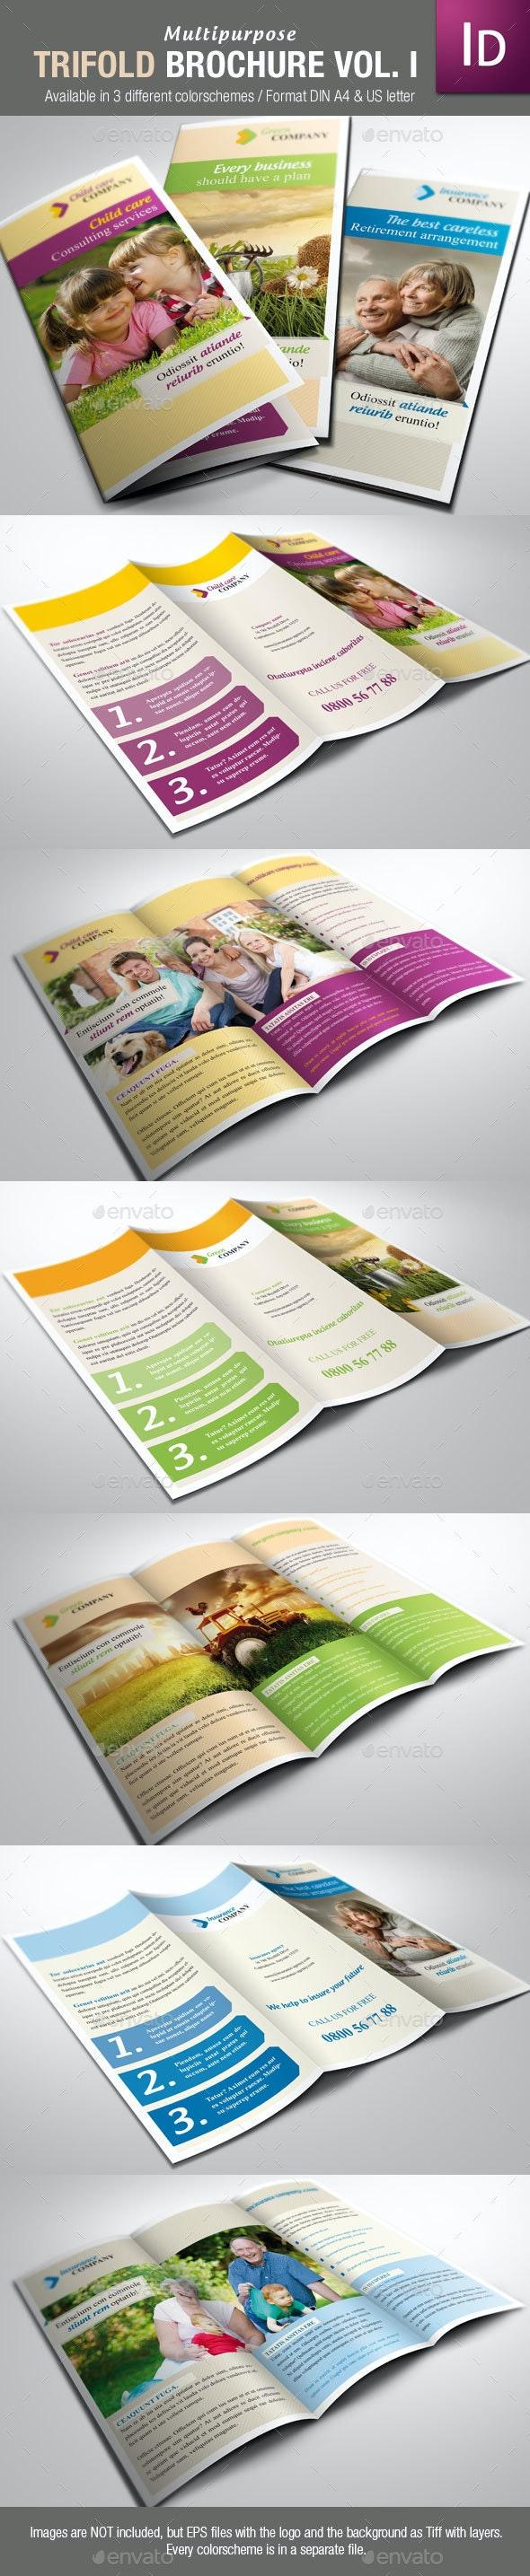 Multipurpose Trifold Brochure Vol. I - Corporate Brochures